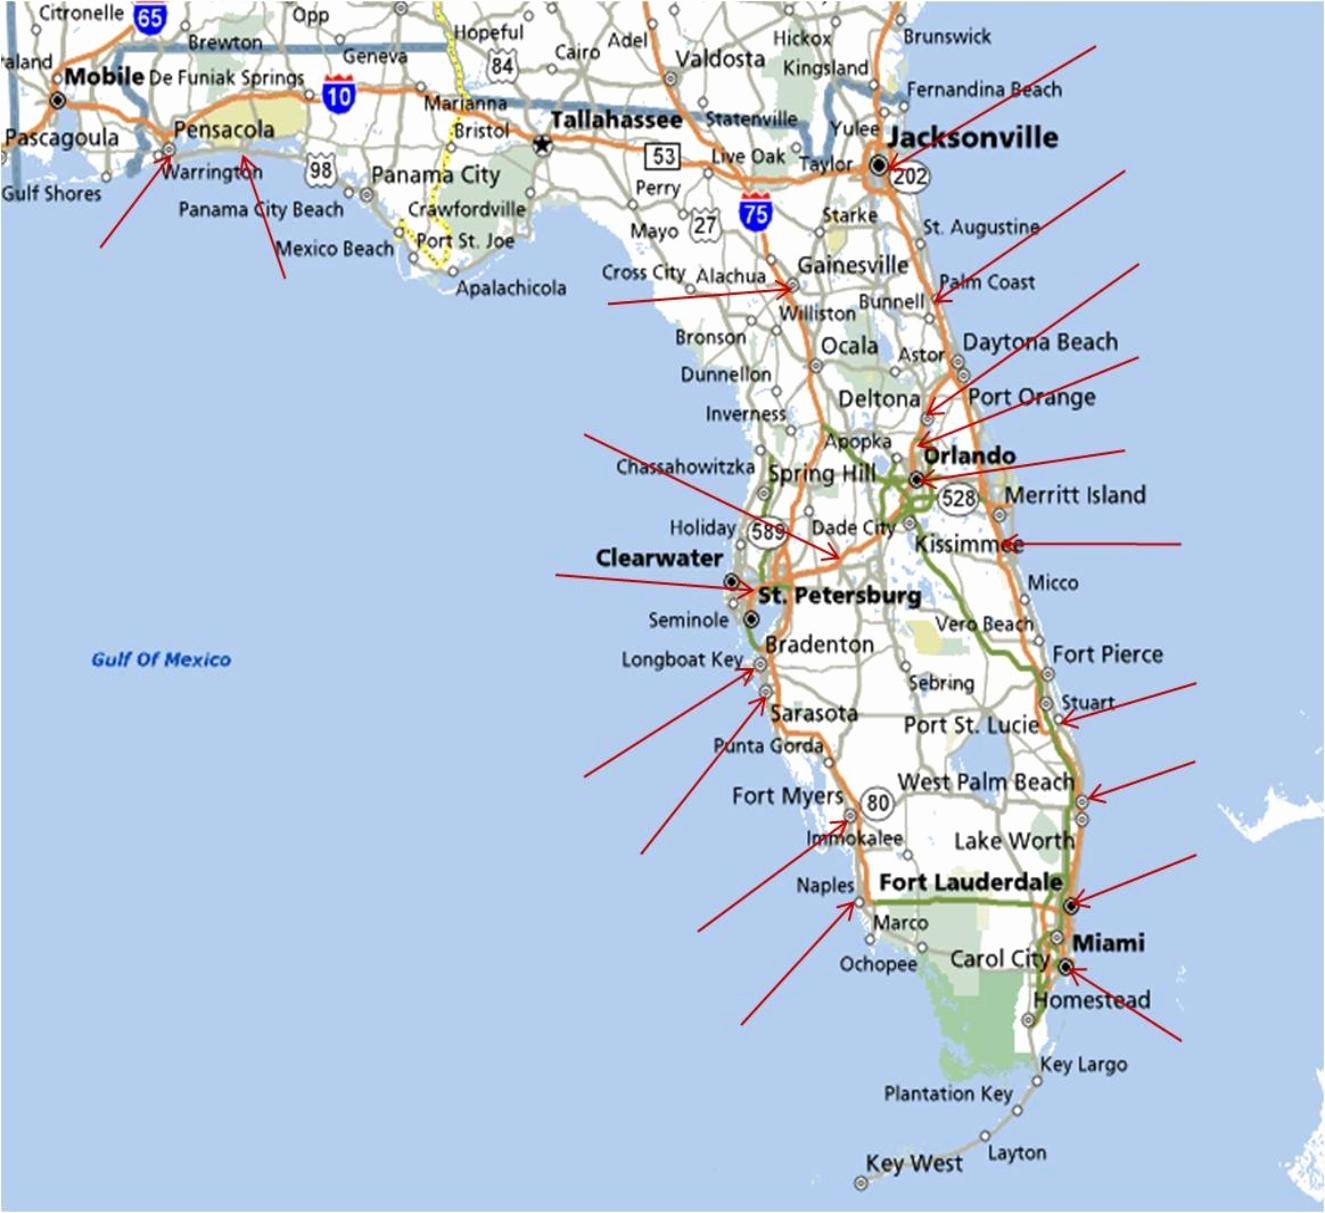 Best East Coast Florida Beaches New Map Florida West Coast Florida - Emerald Coast Florida Map